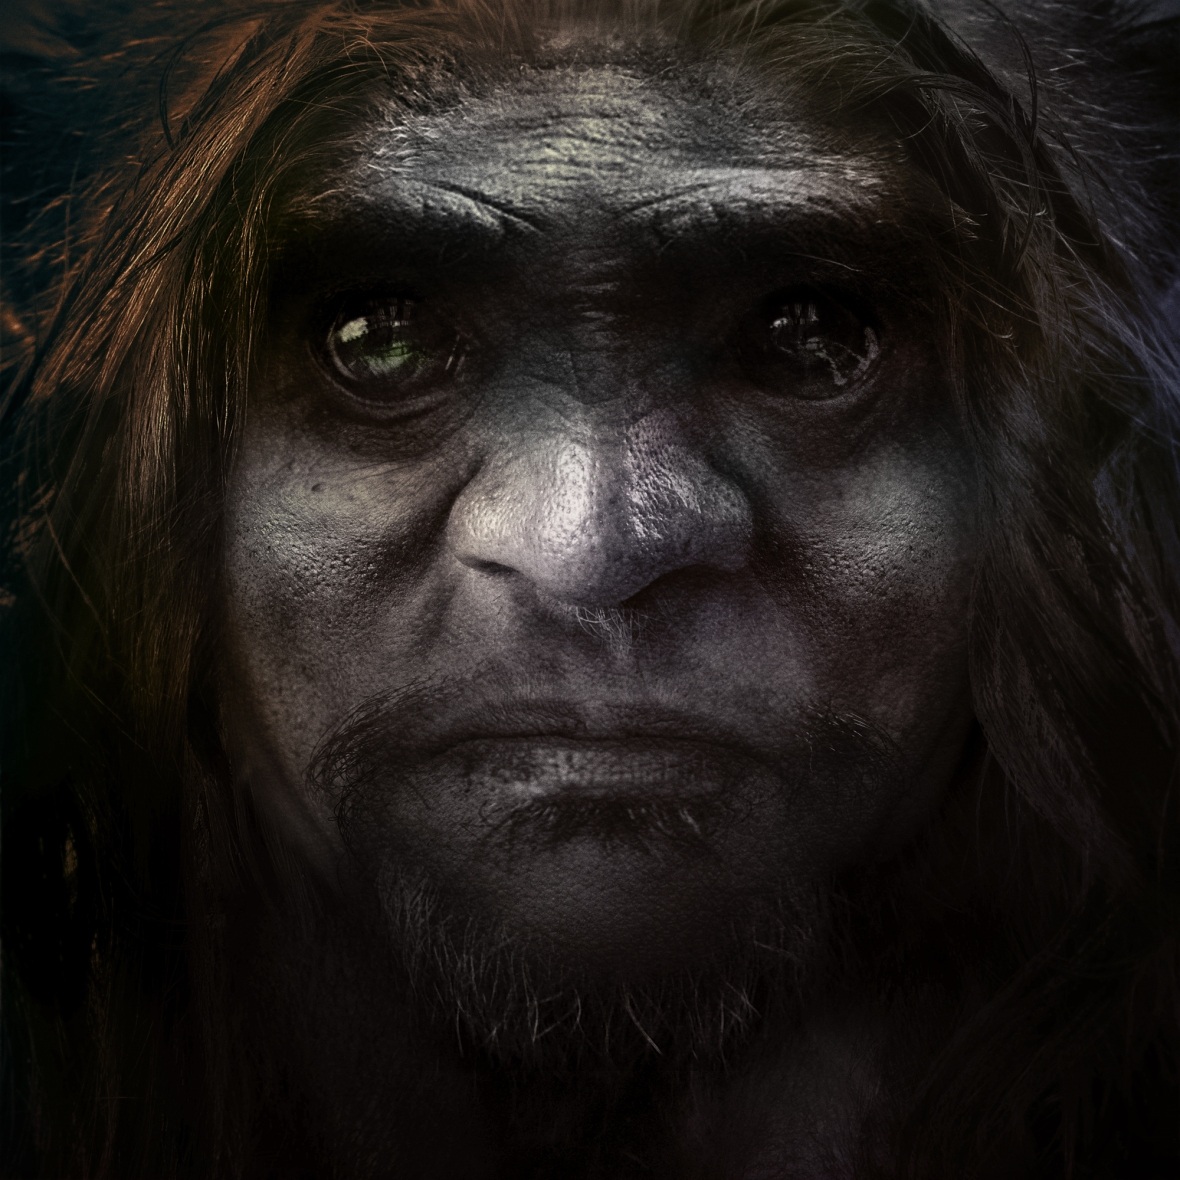 bigfoot-face-14.jpg